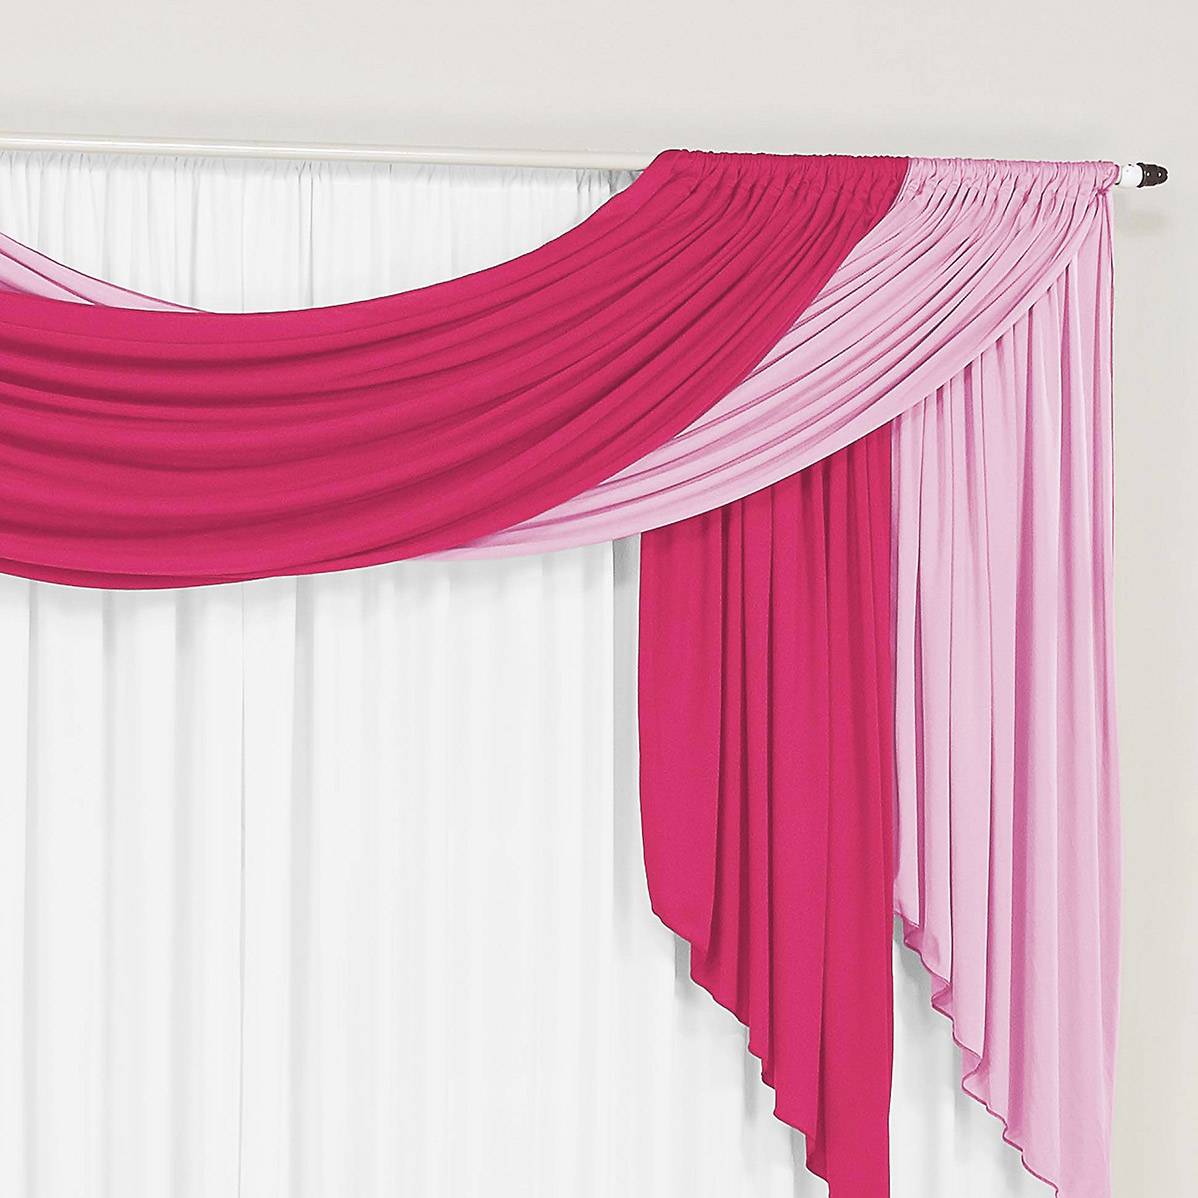 Cortina 2 metros Isabela Pink Rosa  com 1 peças